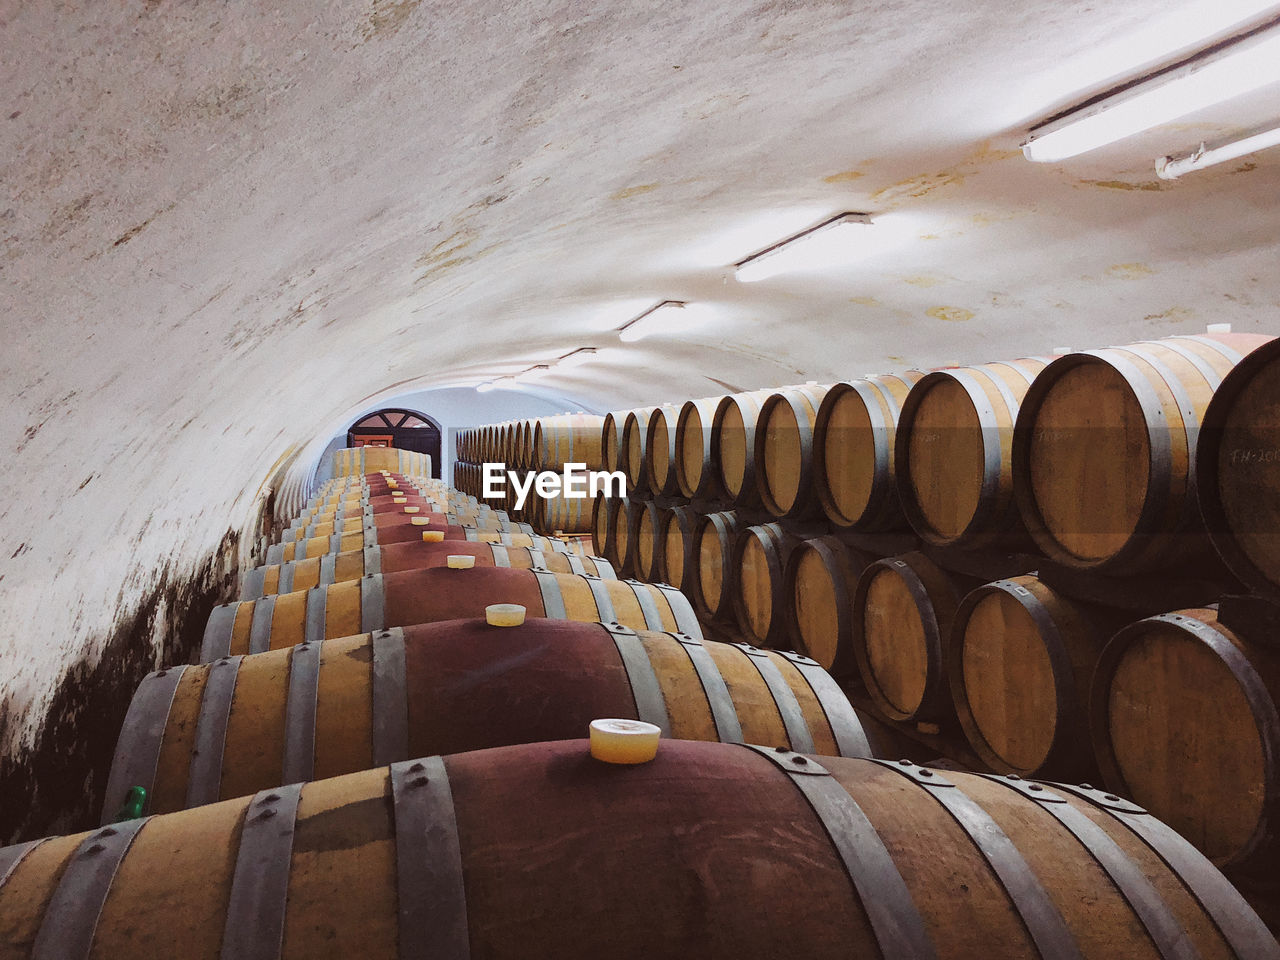 Row of wine barrels in wine cellar